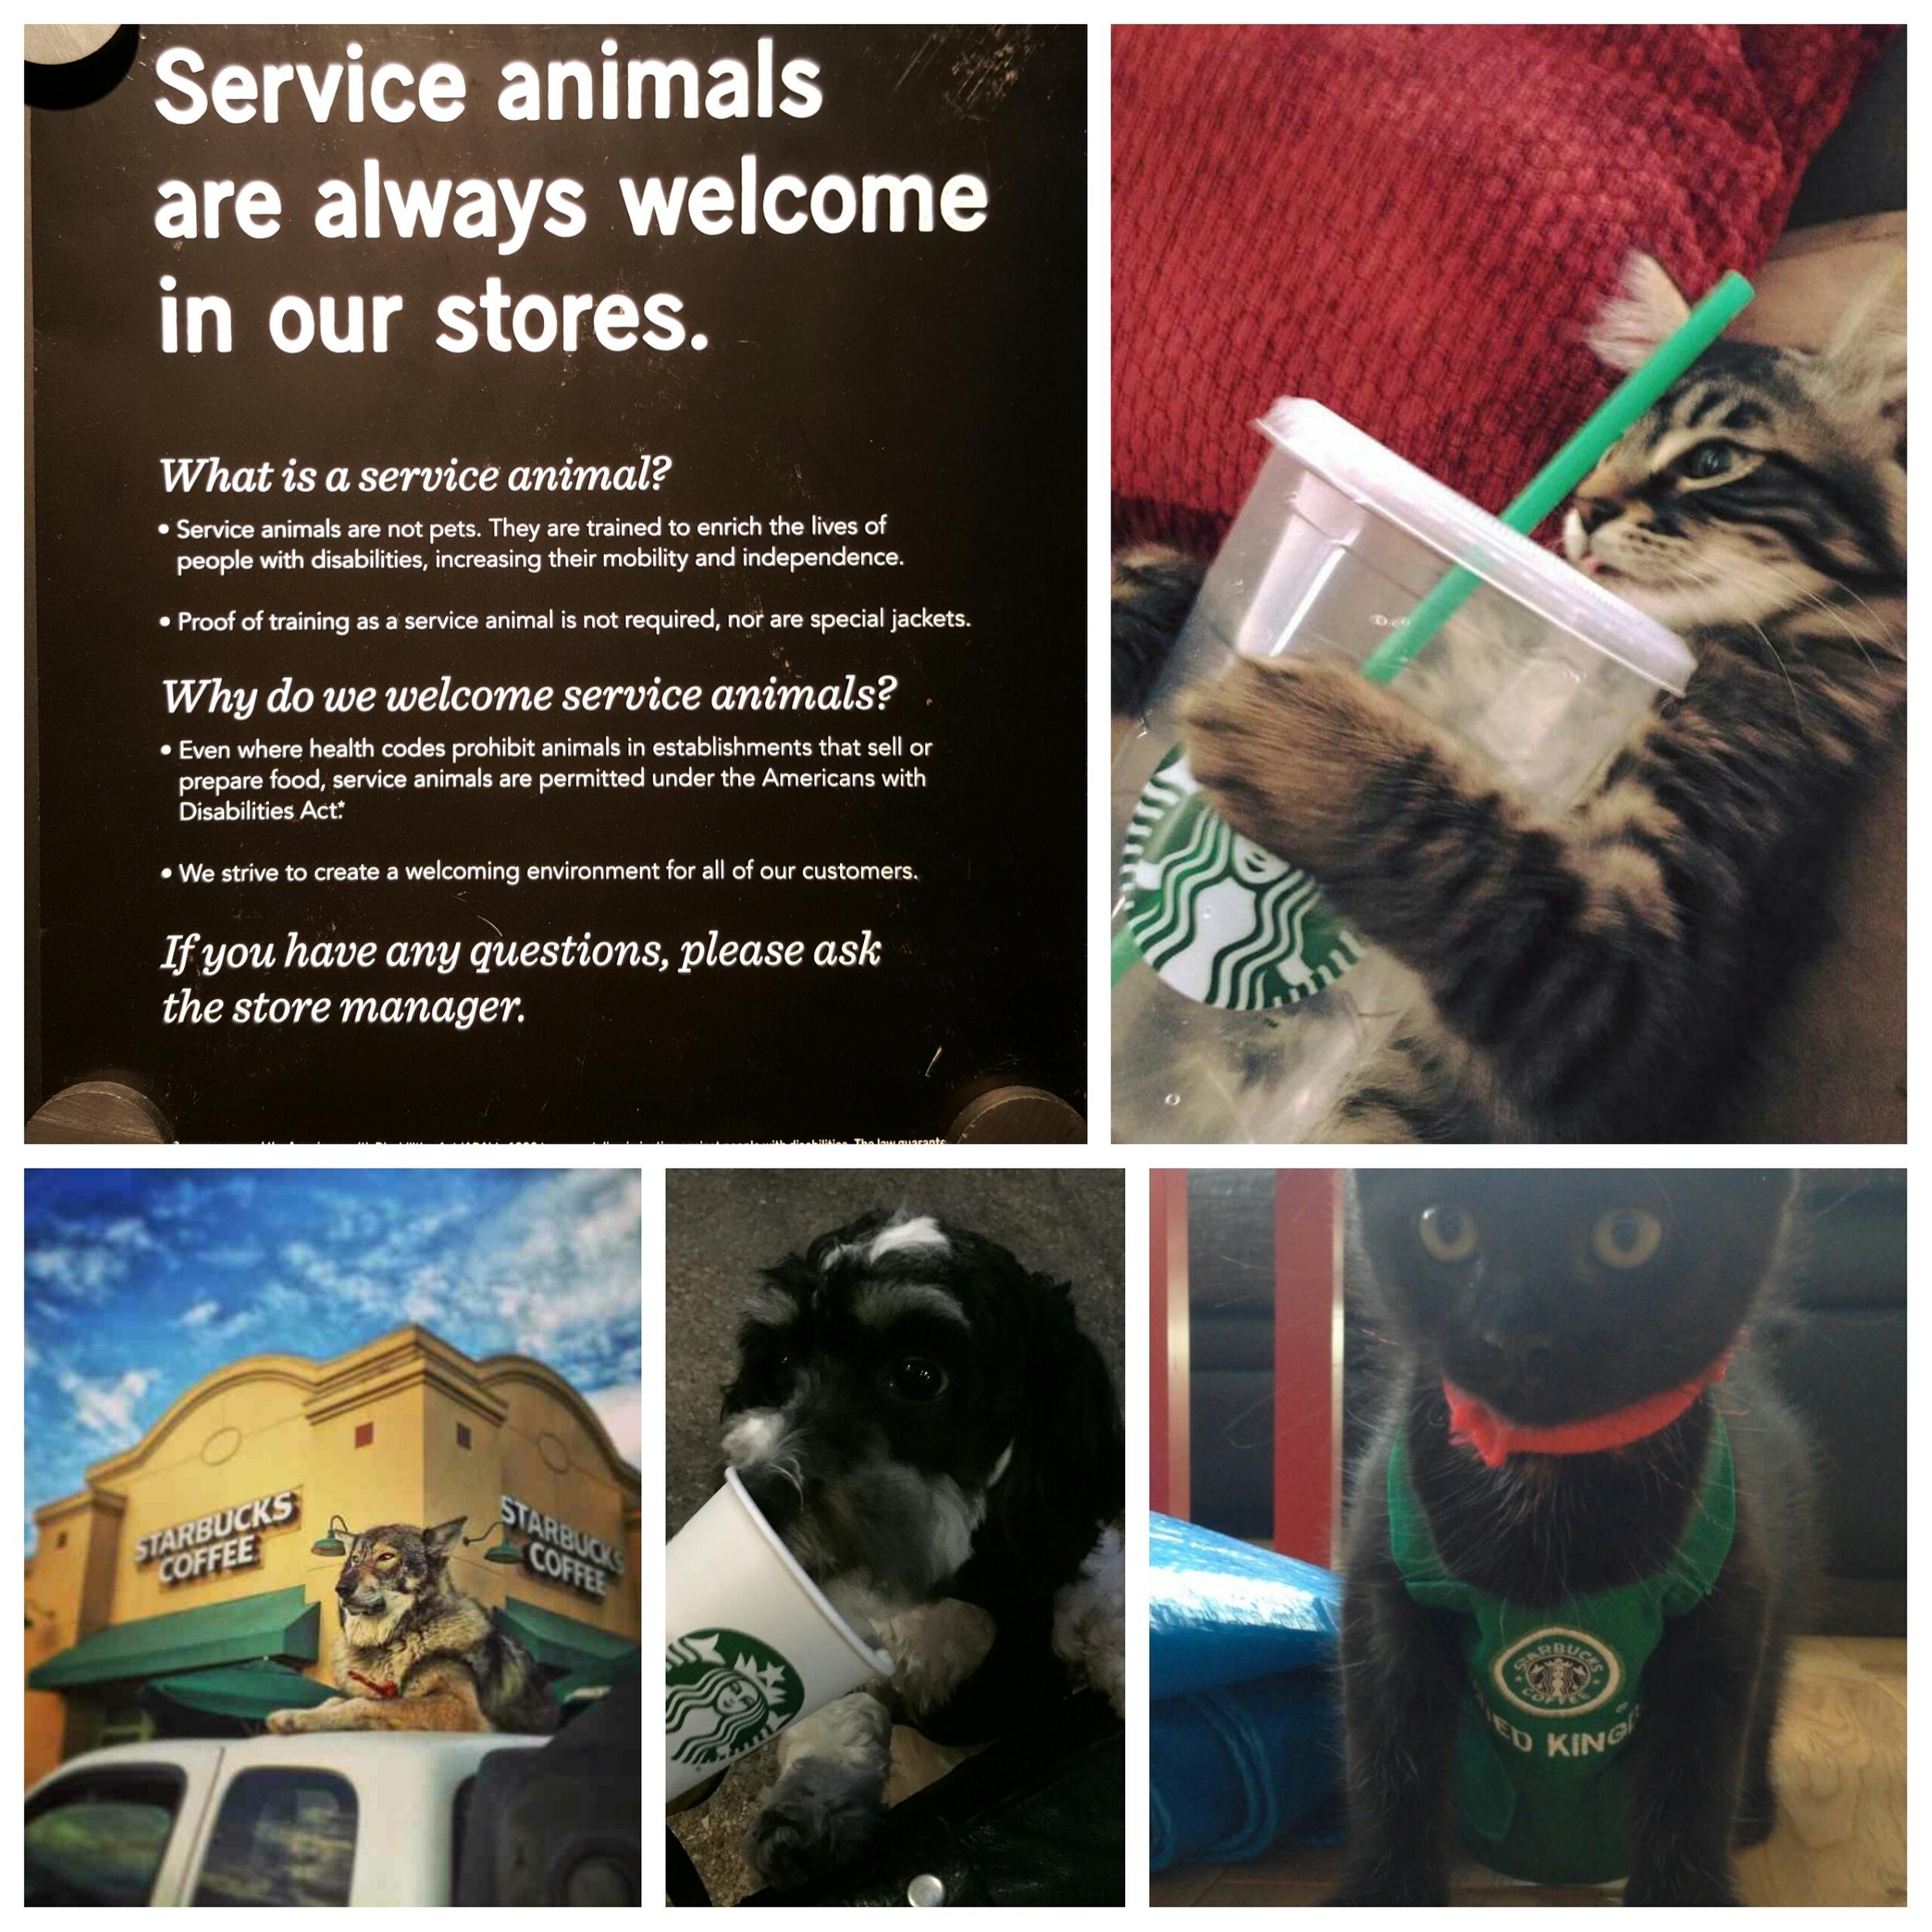 PhotoGrid_1436669909019-Service-animals-welcome.jpg